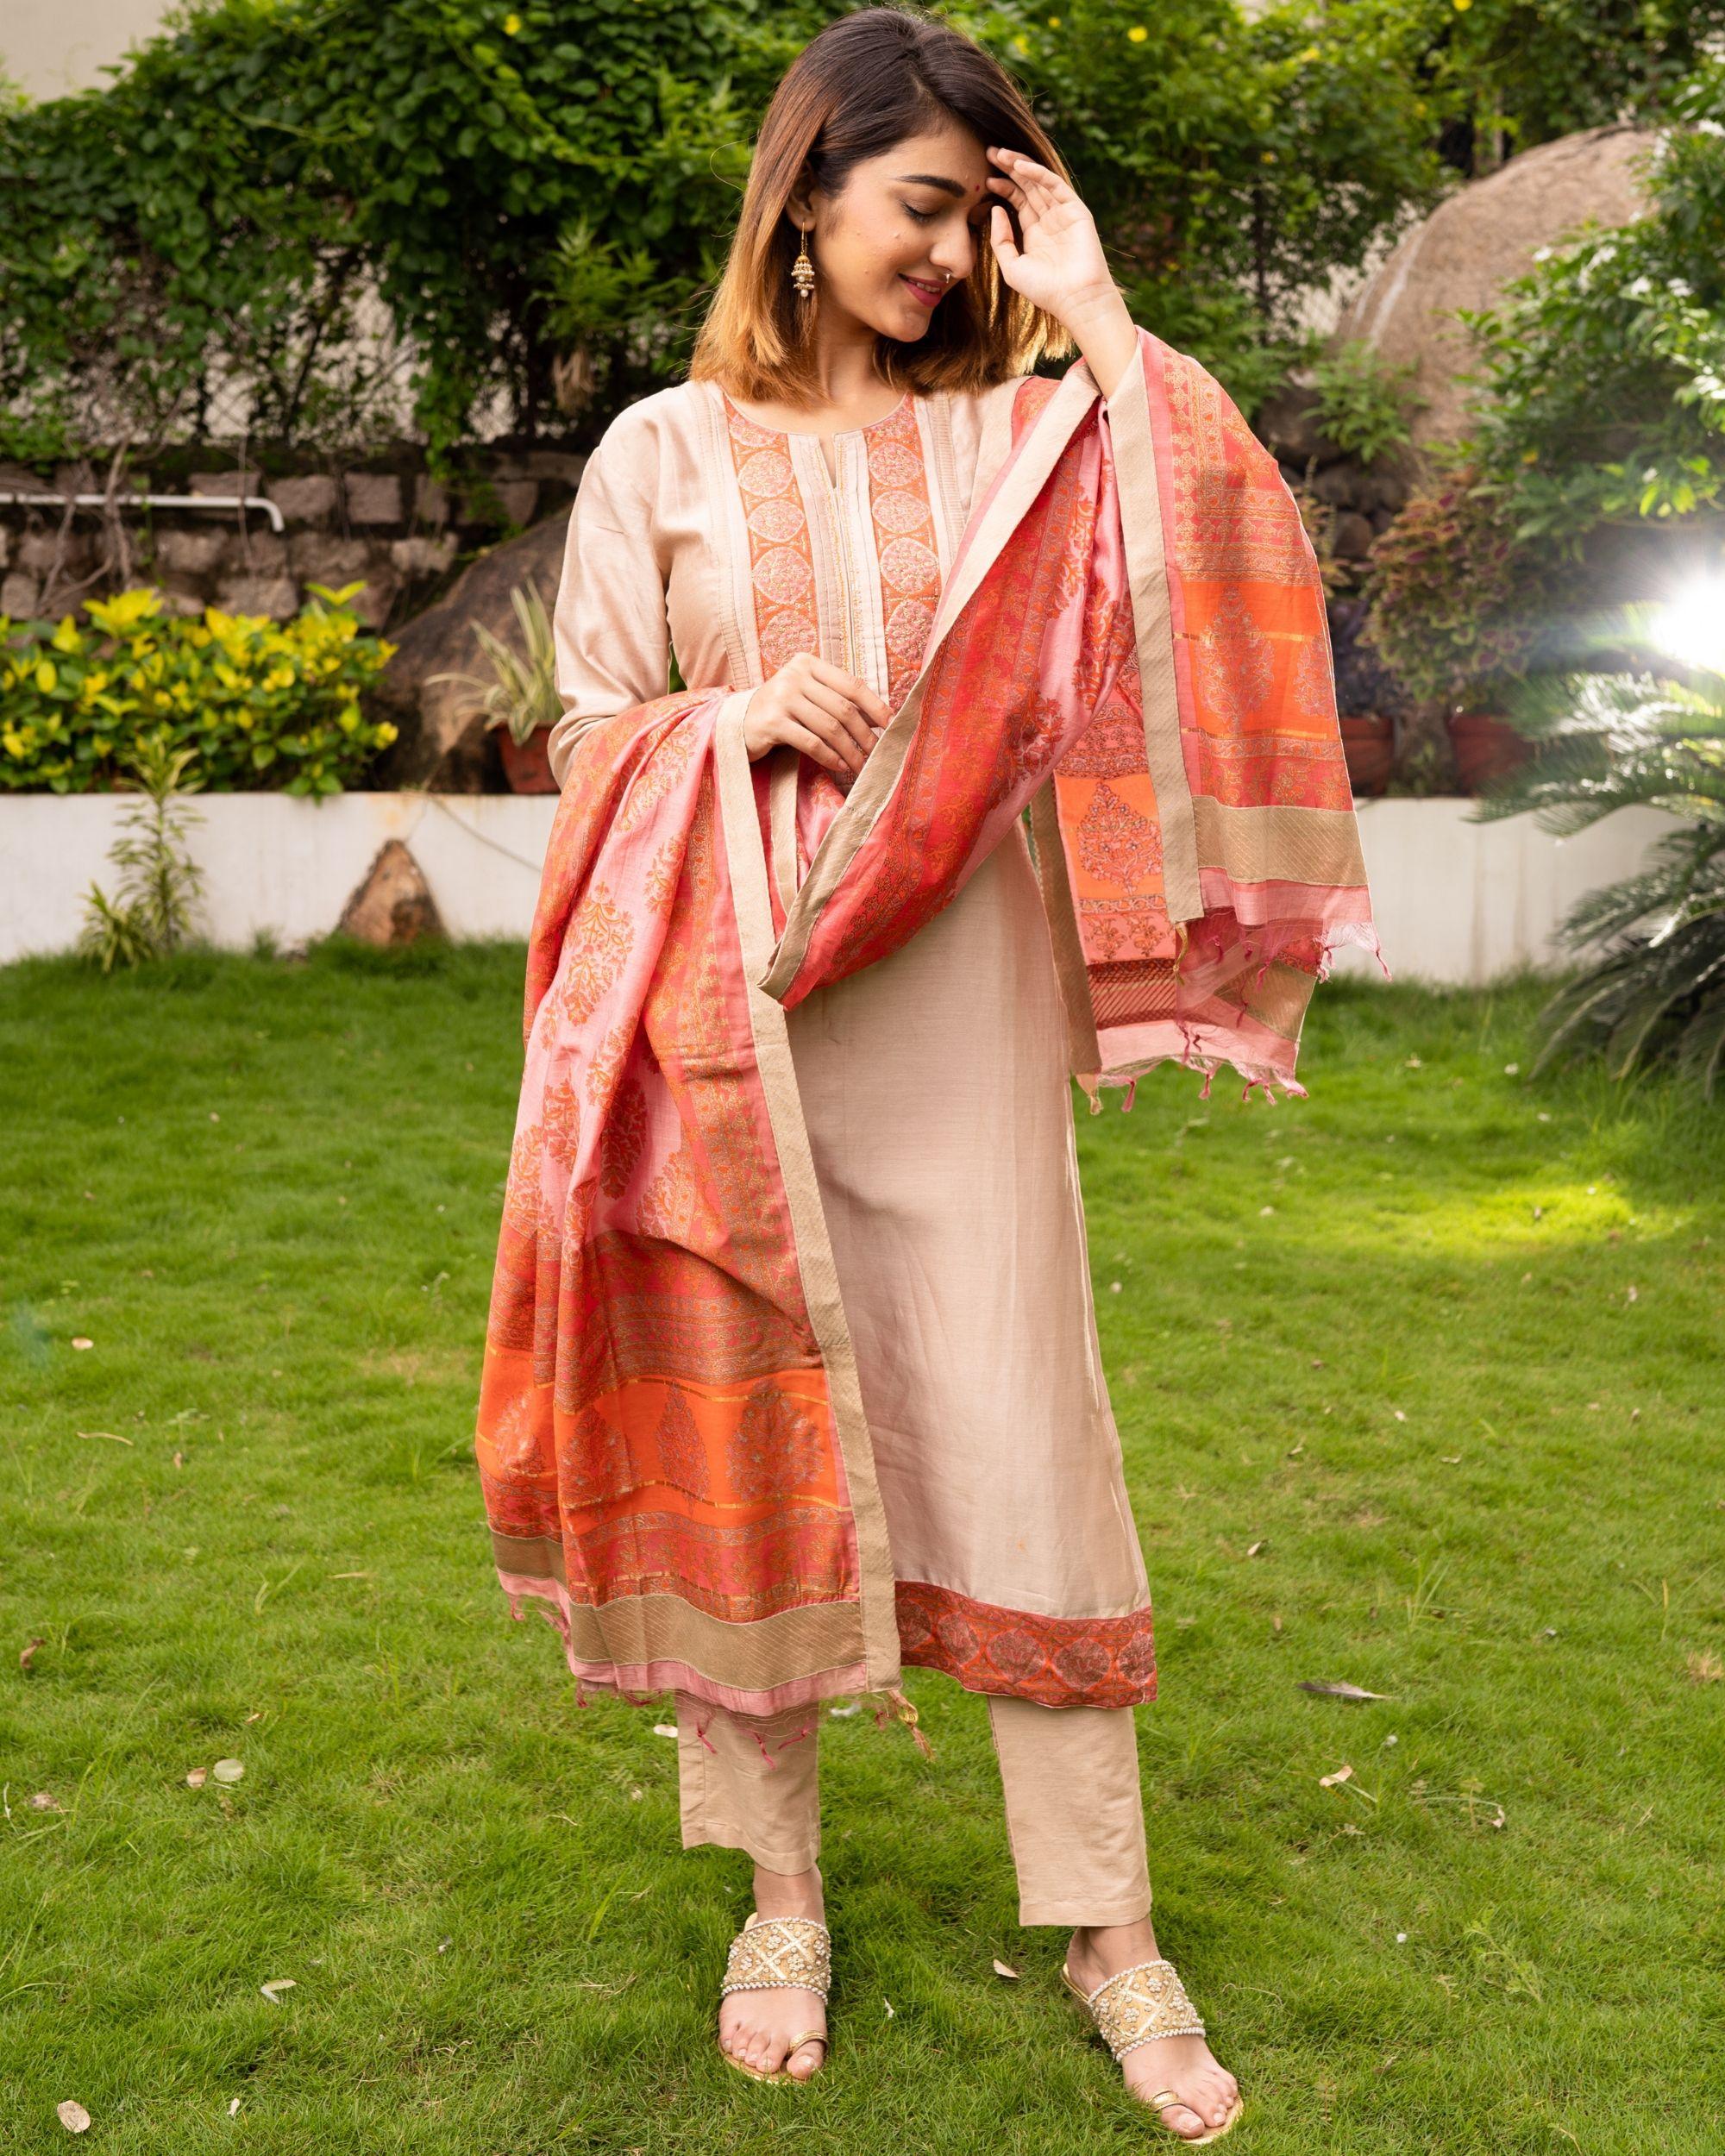 Beige Pure Maheswari Silk Set with Peach Mughal Printed Dupatta - Set Of Three